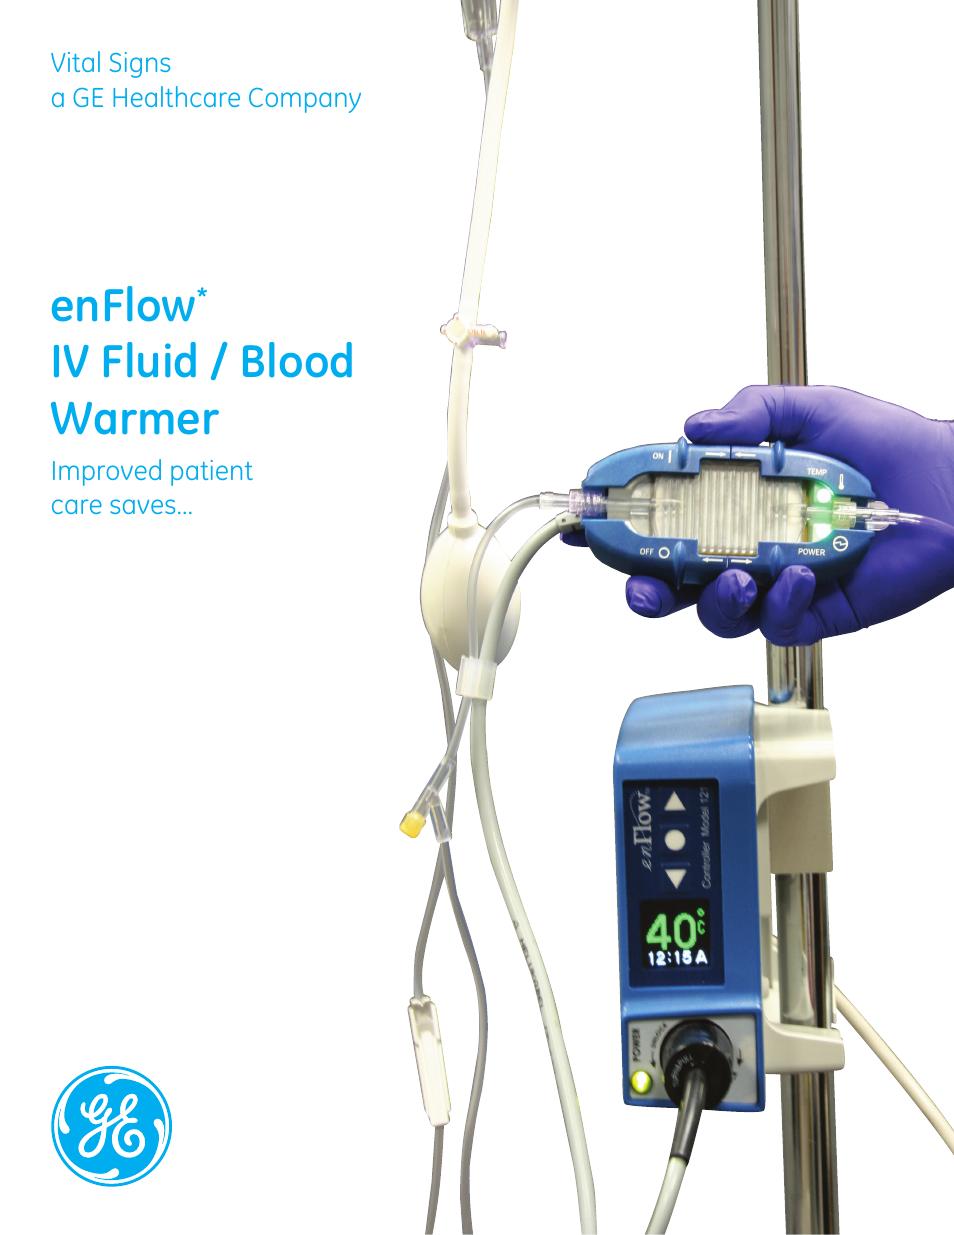 ge healthcare enflow iv fluid and blood warmer